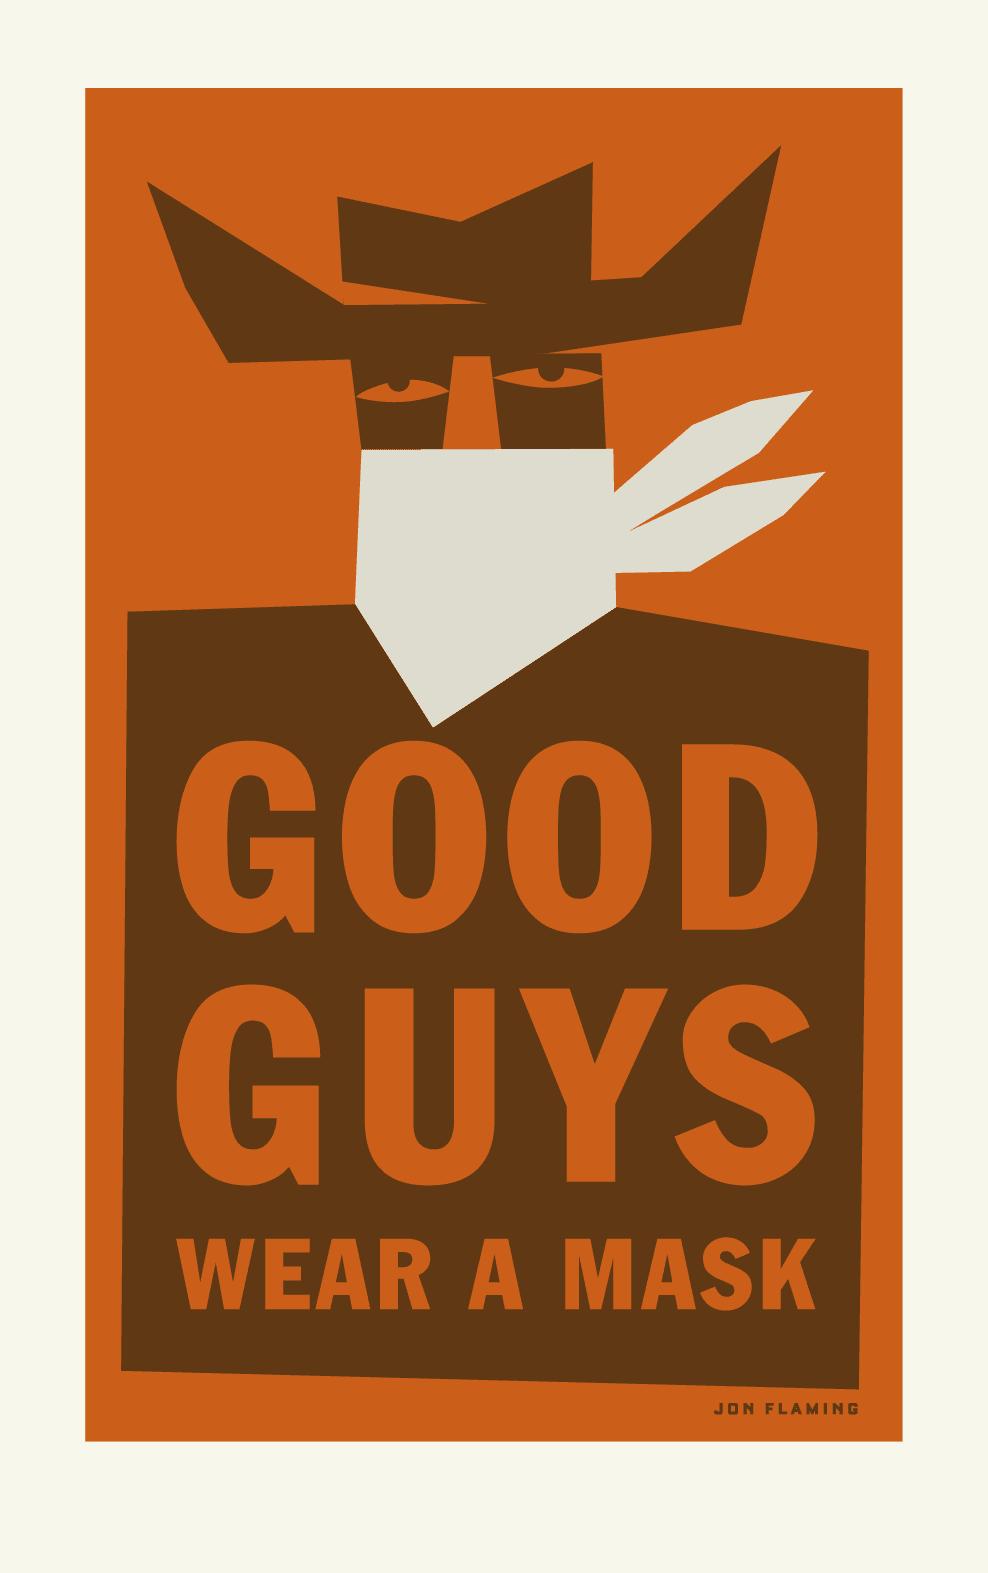 Good Guys Wear A Mask, 2020